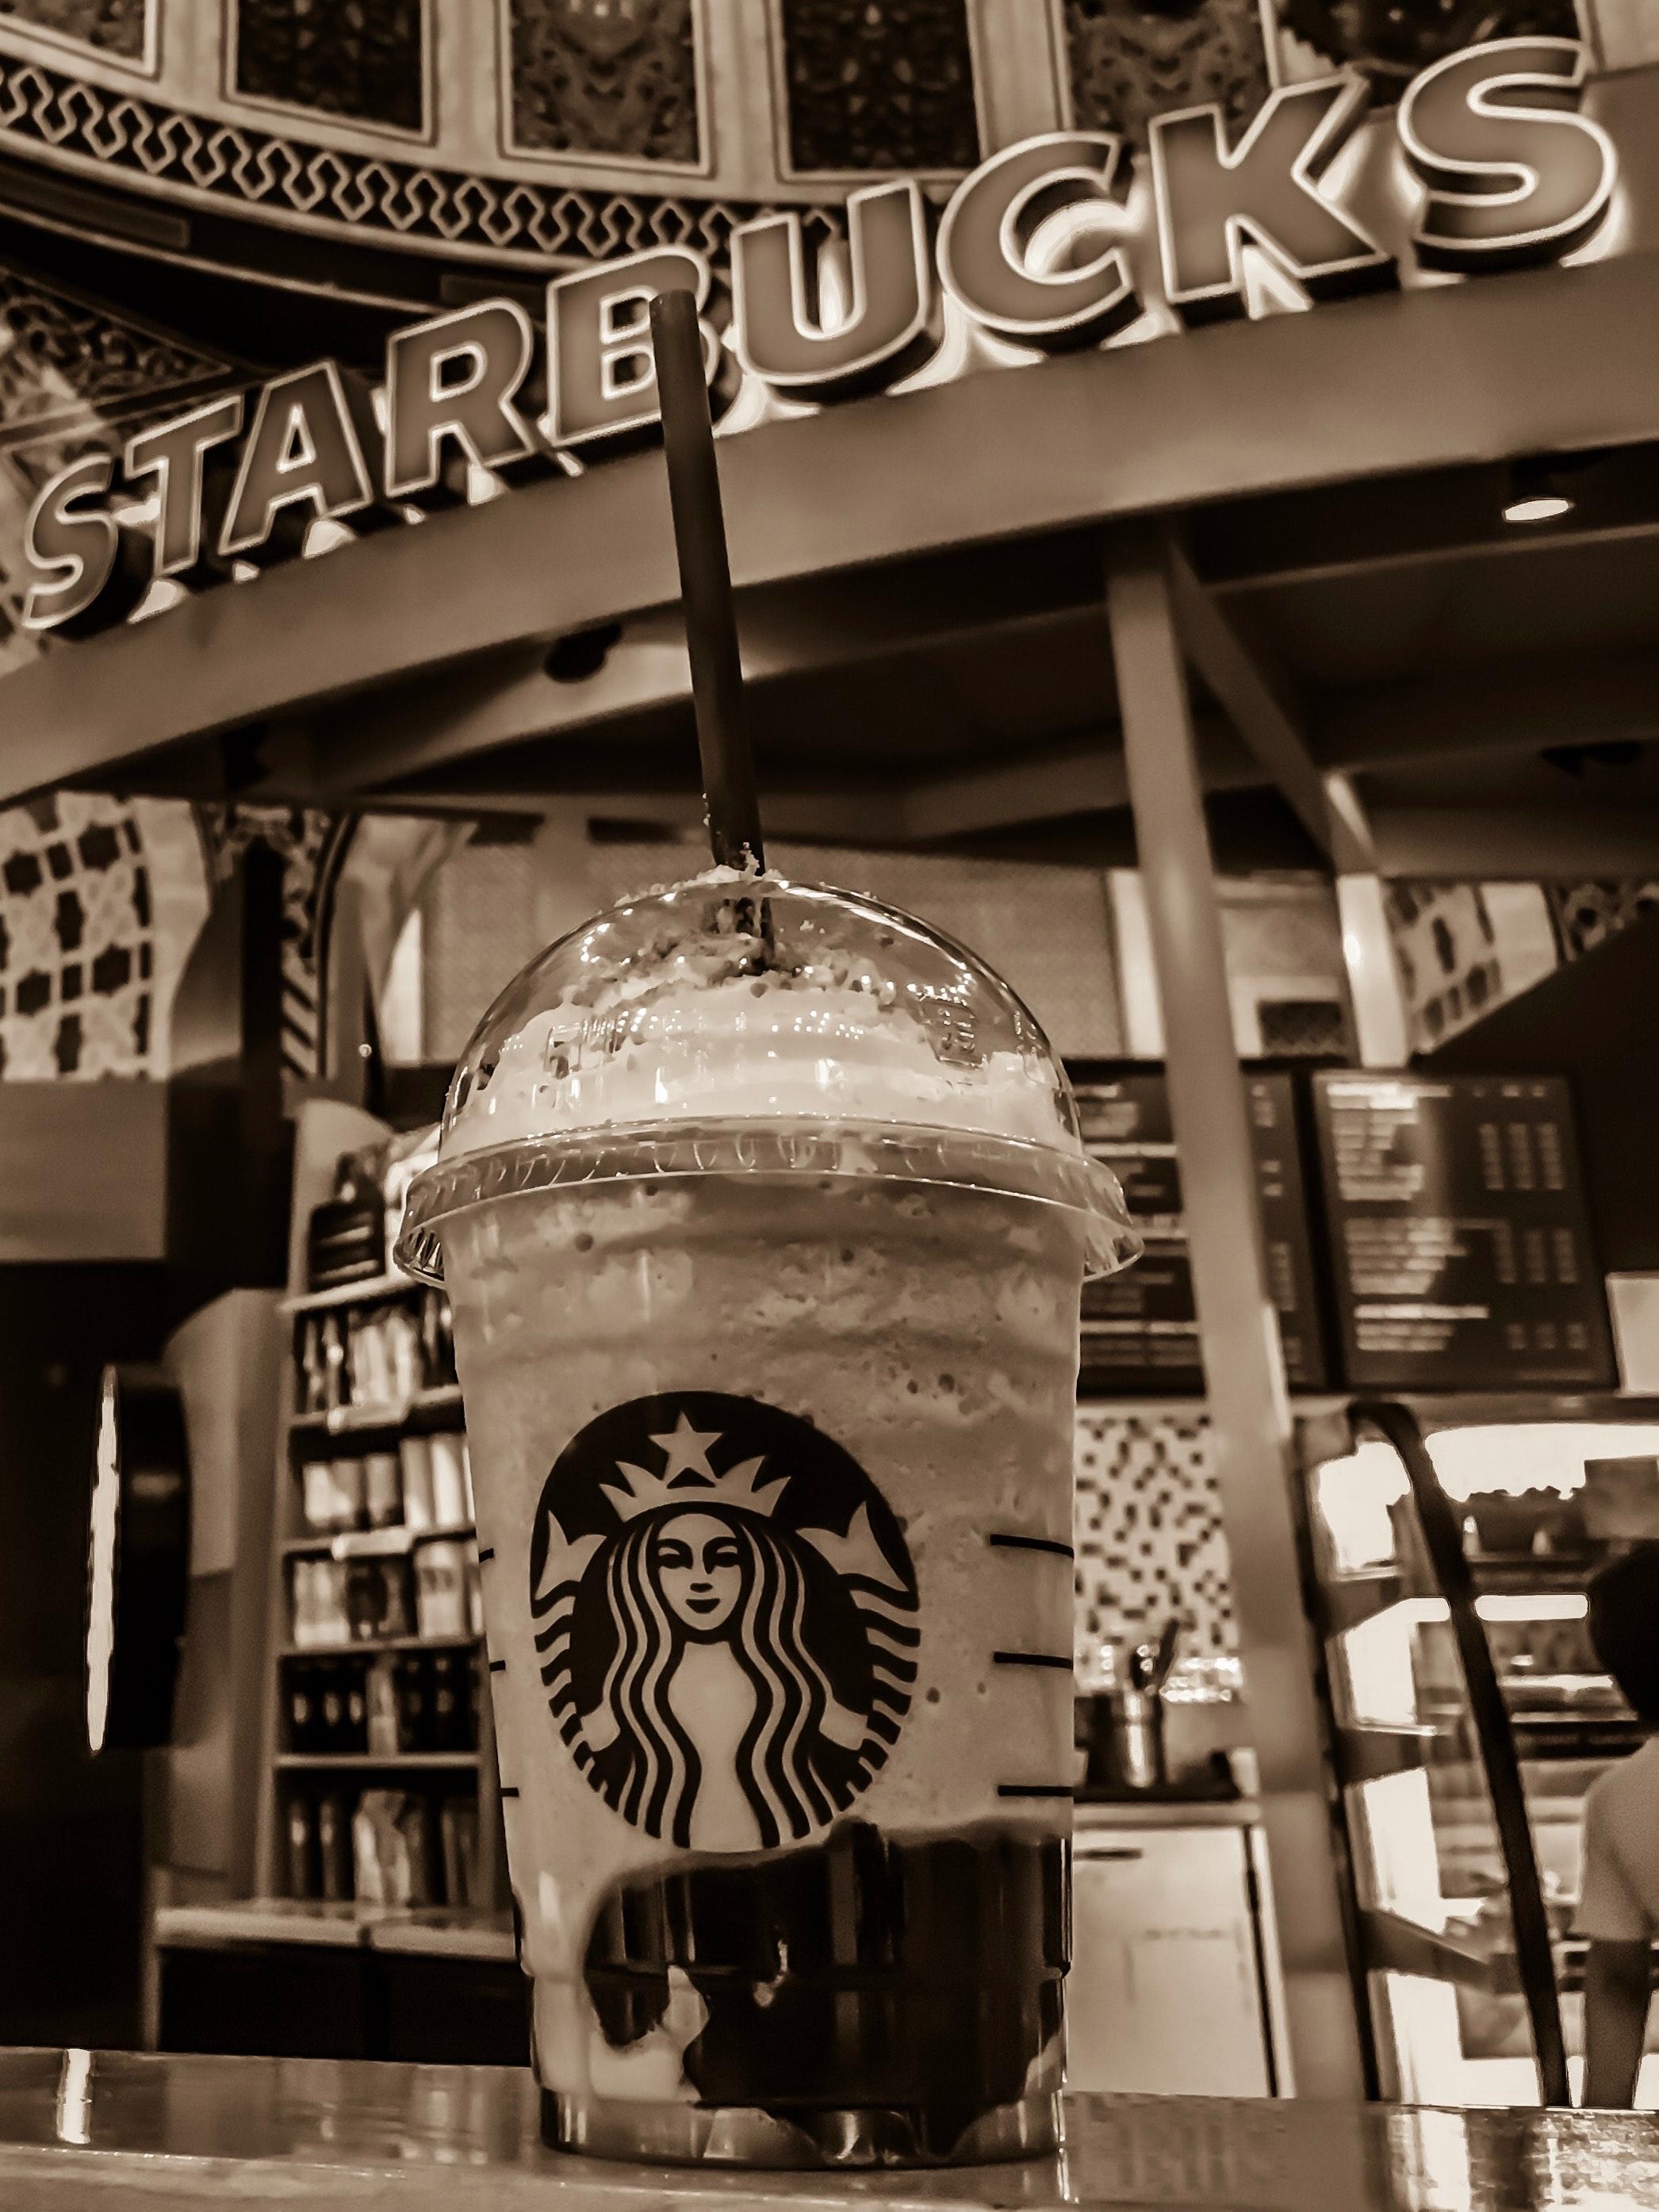 Starbucks Barista